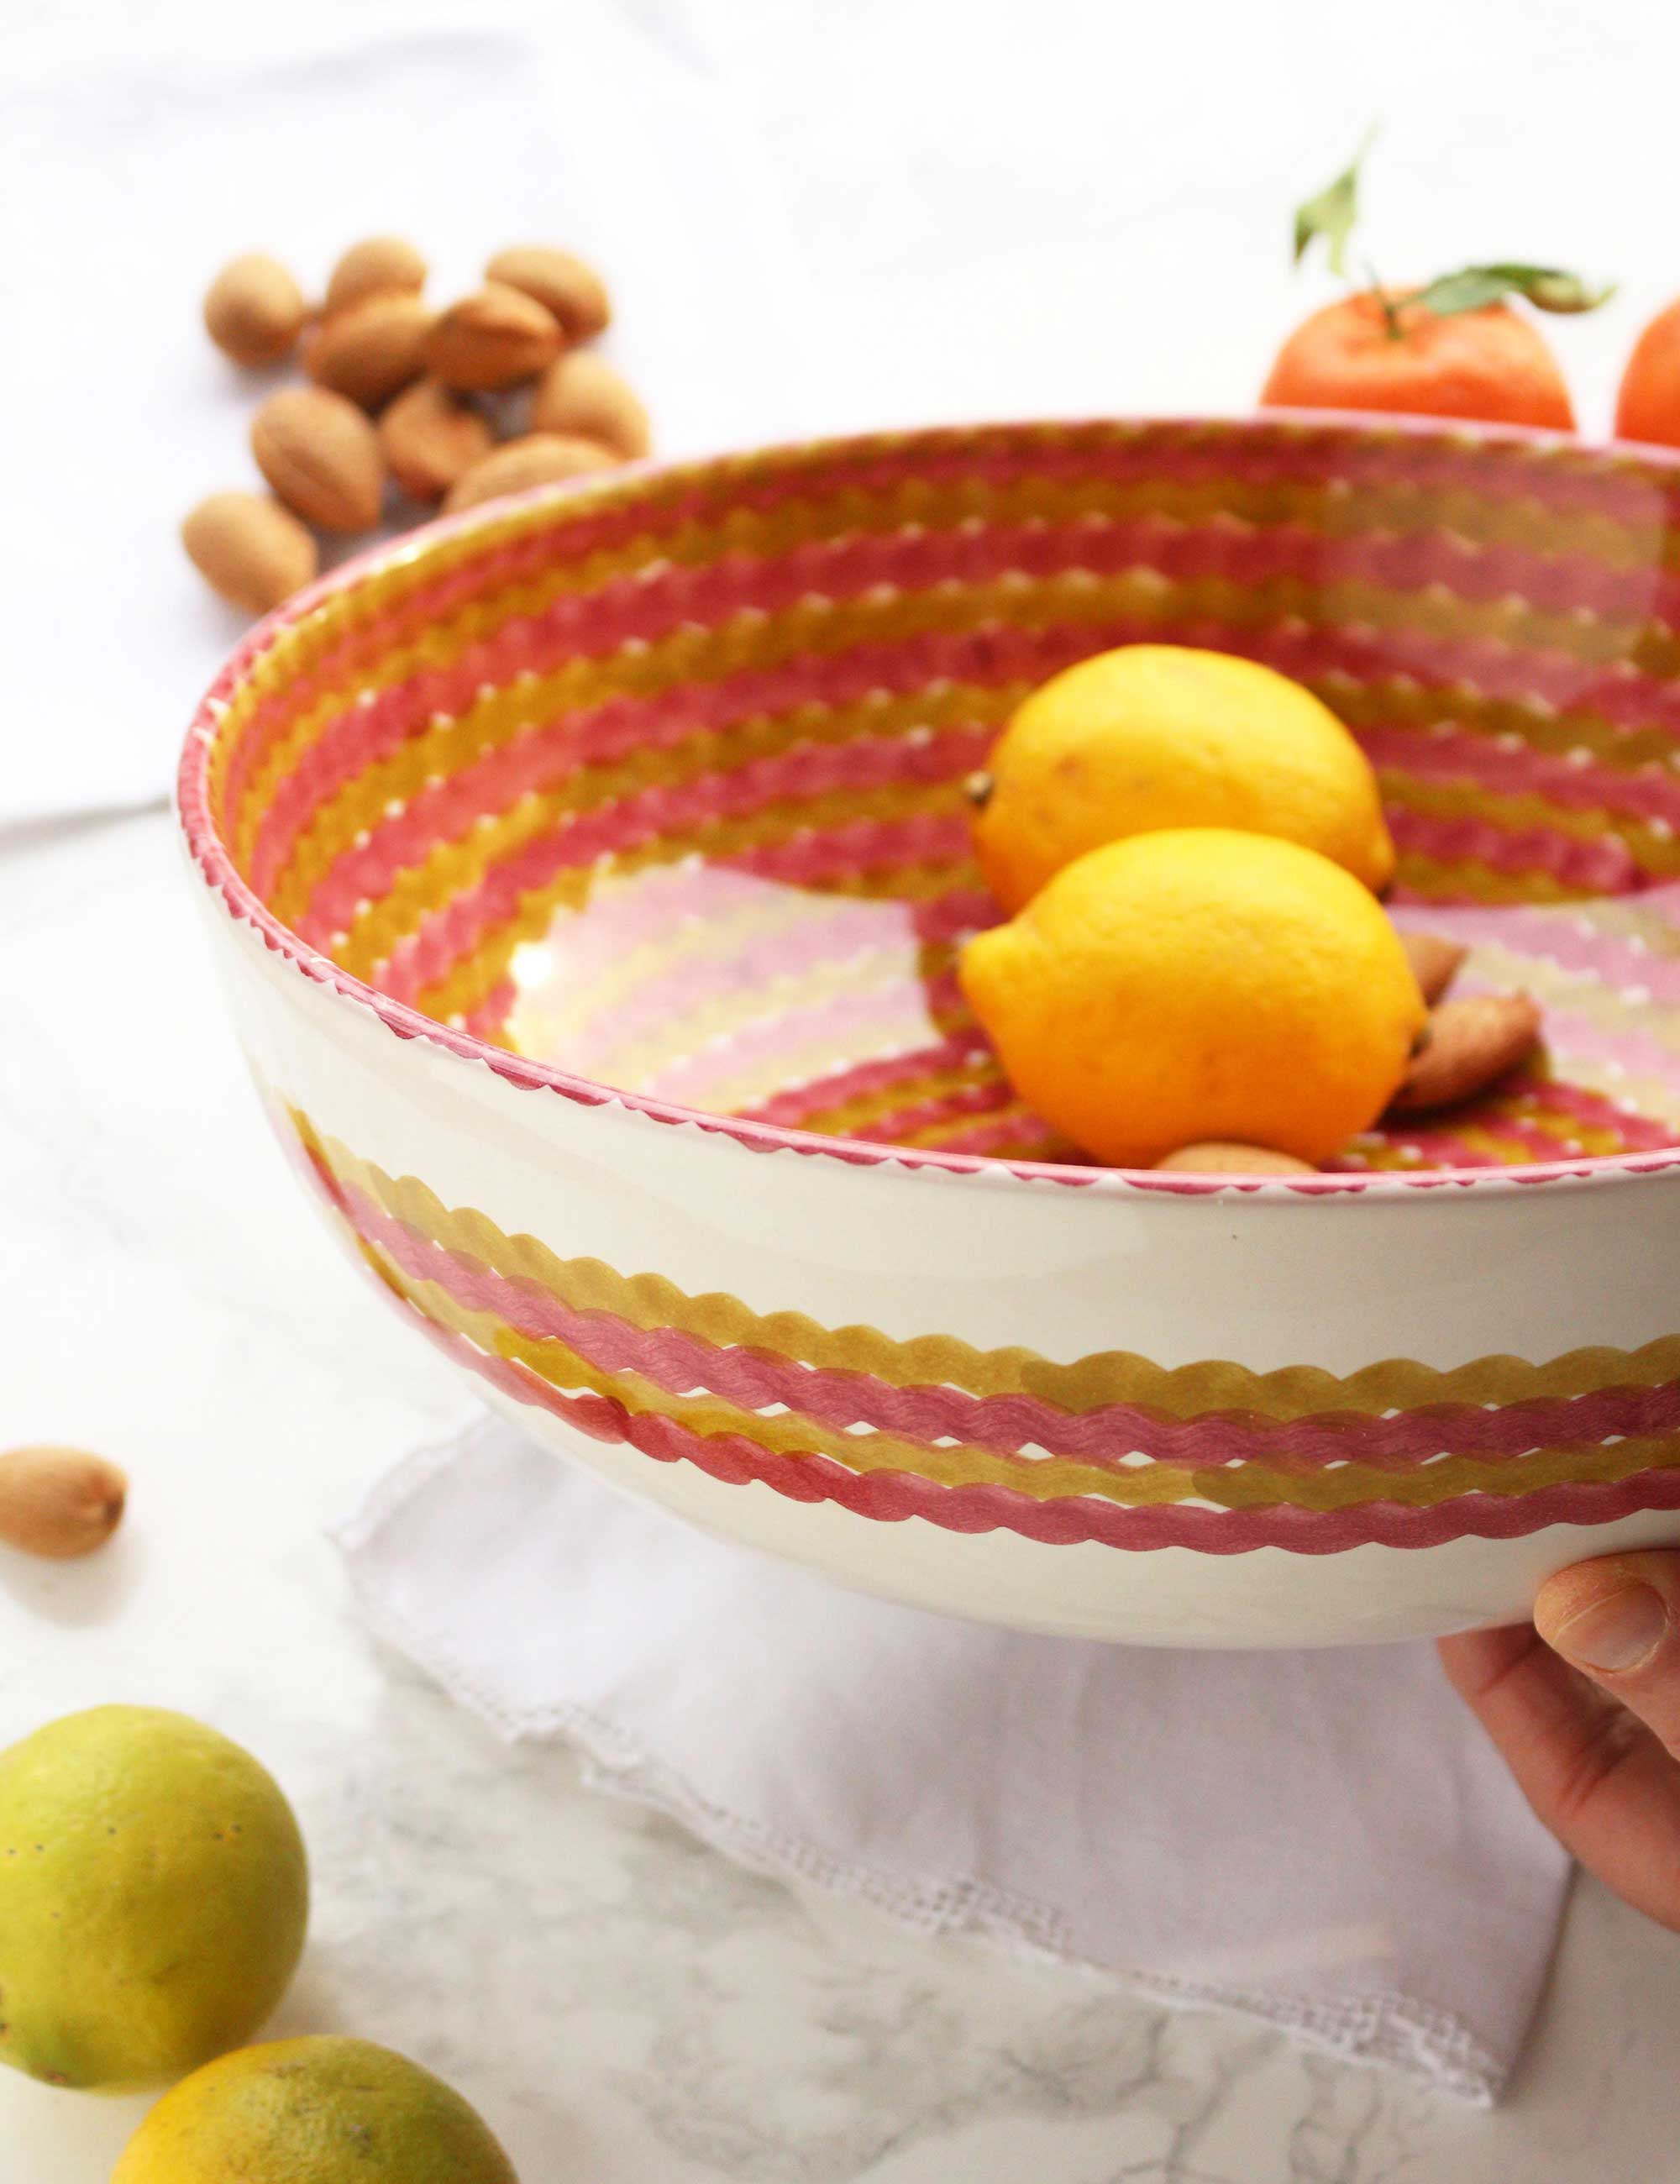 Insalatiera in ceramica siciliana decorata Mediterra